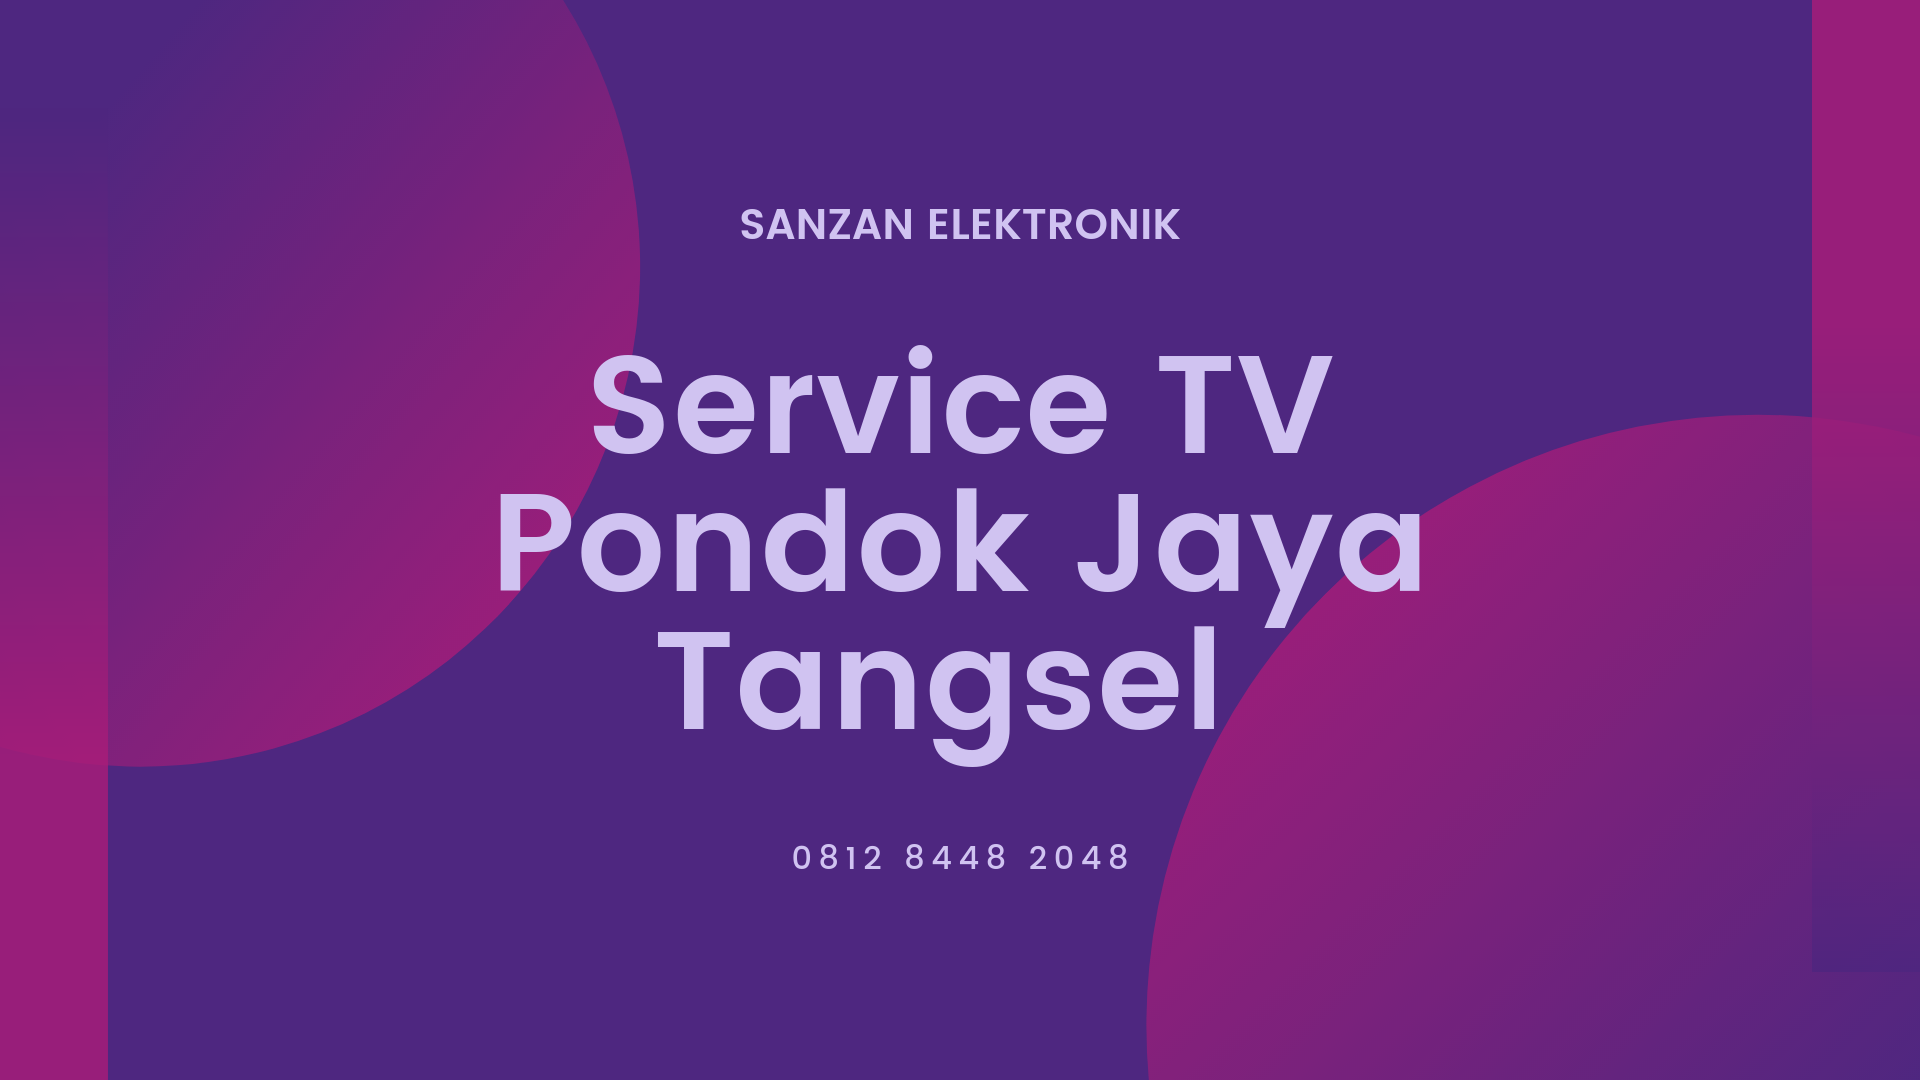 Service TV Pondok Jaya Tangsel